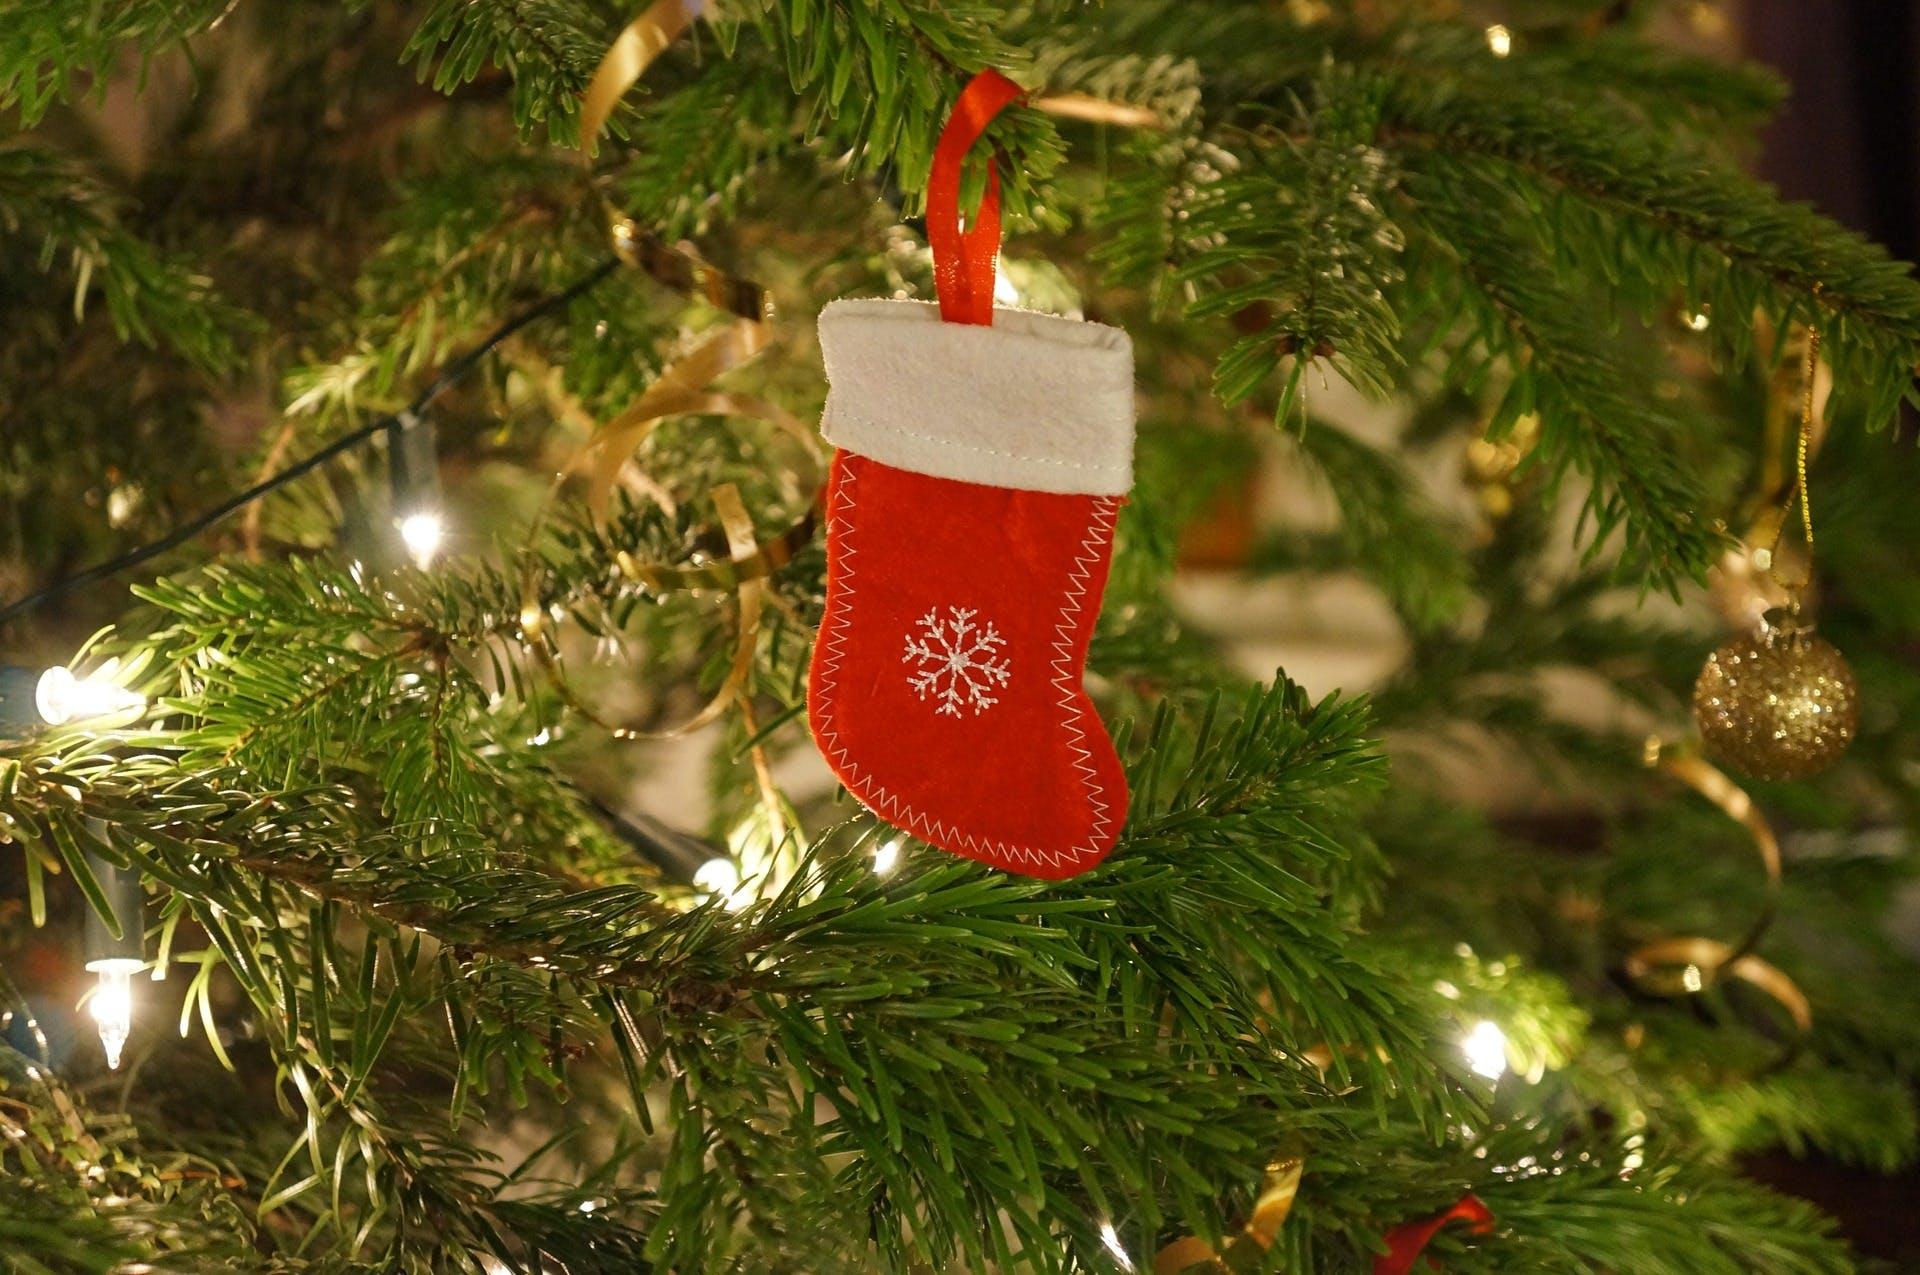 A Christmas stocking